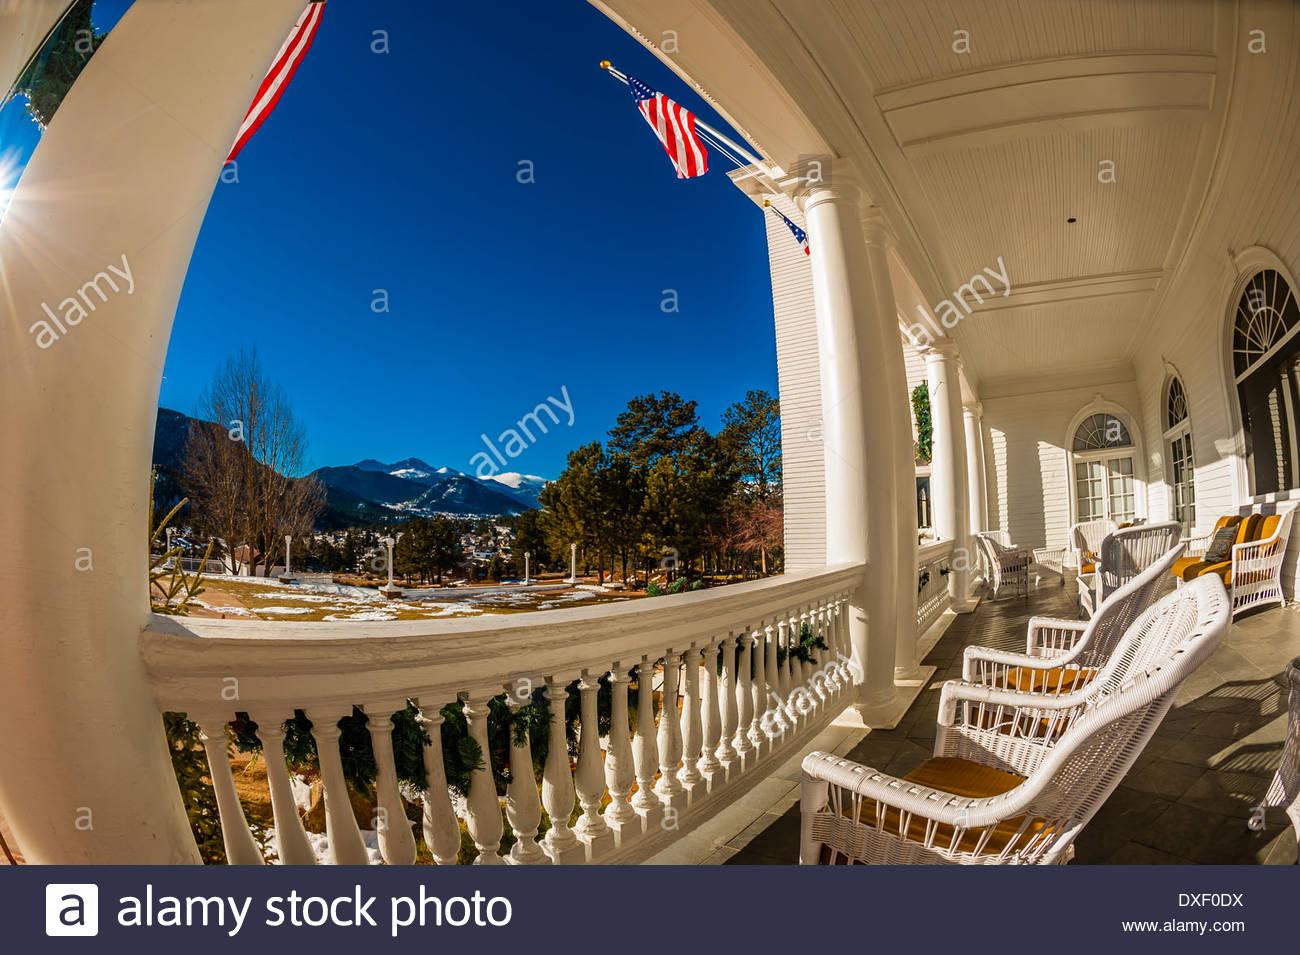 The historic Stanley Hotel, Estes Park, Colorado USA. - Stock Image